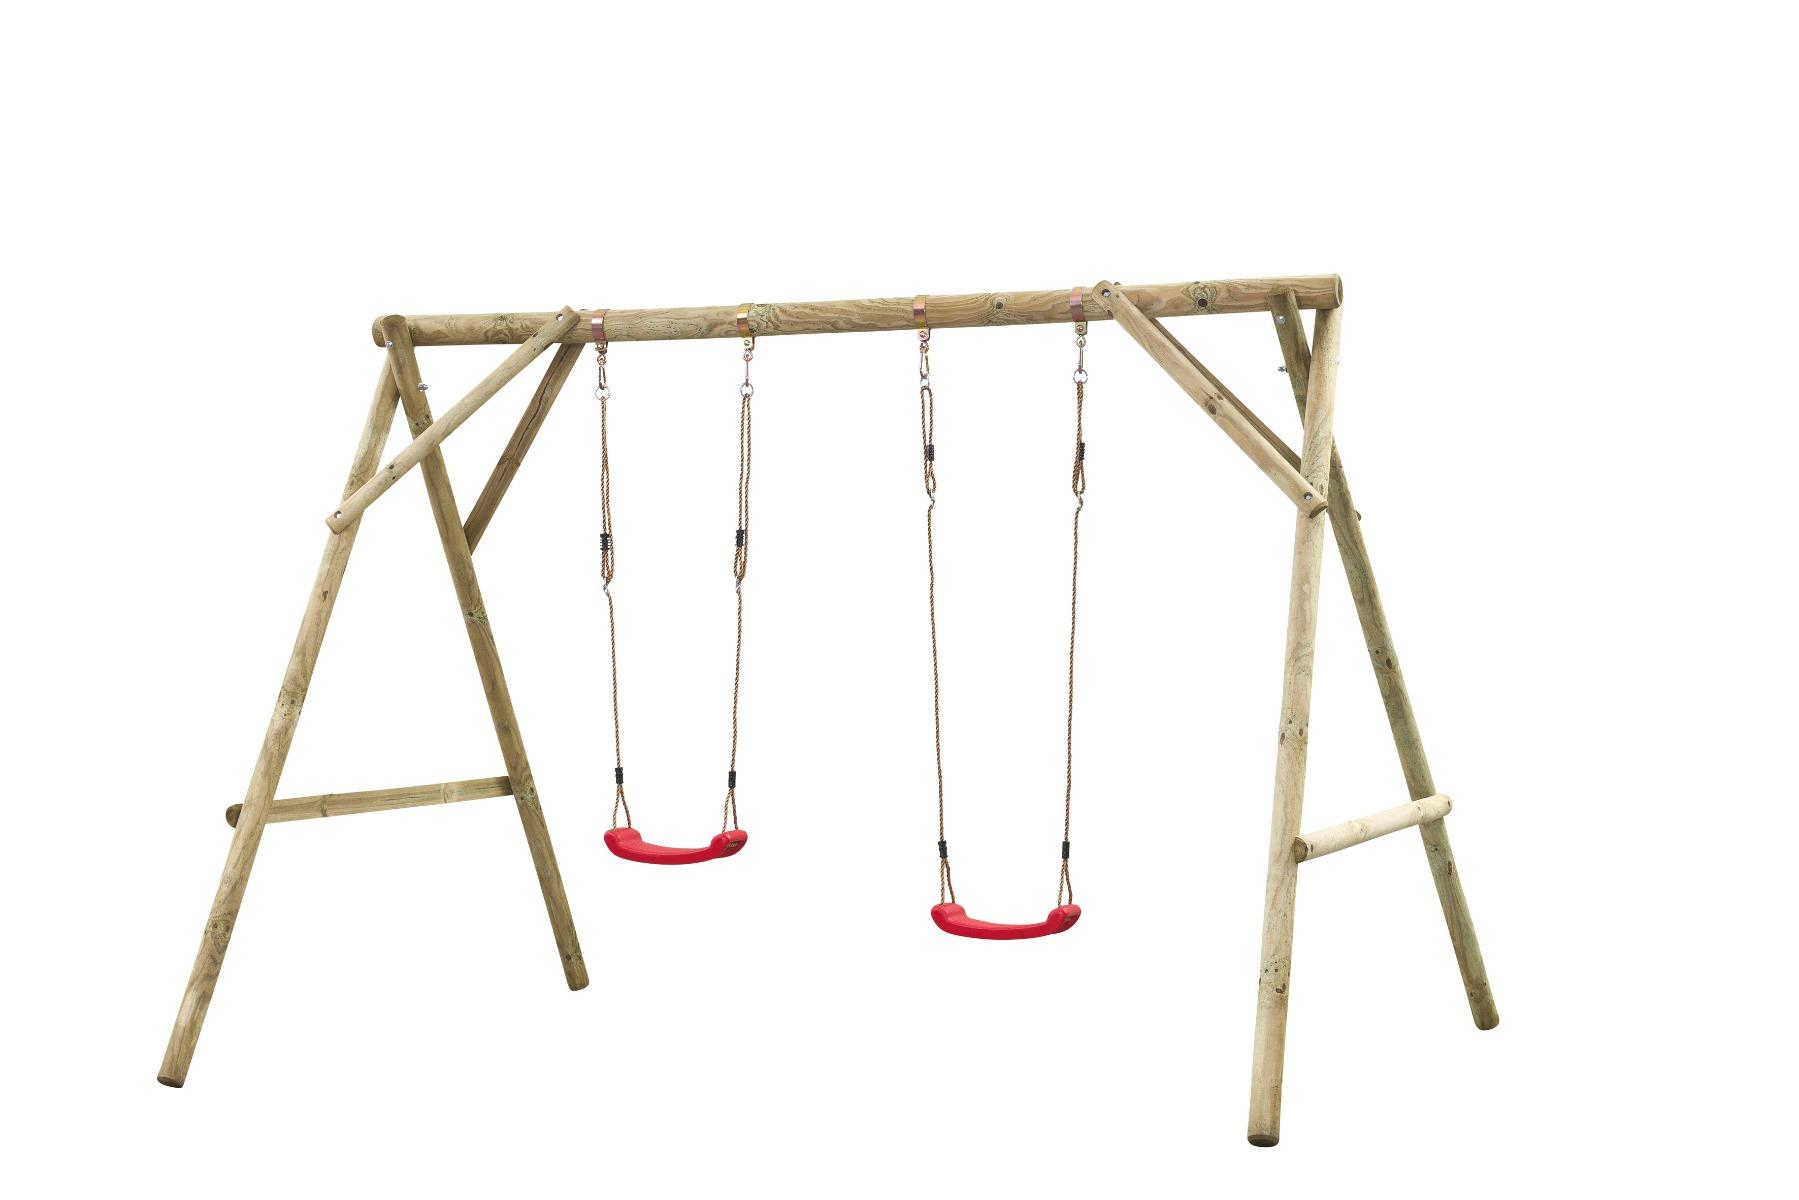 Holzschaukel Spielgerät Holz